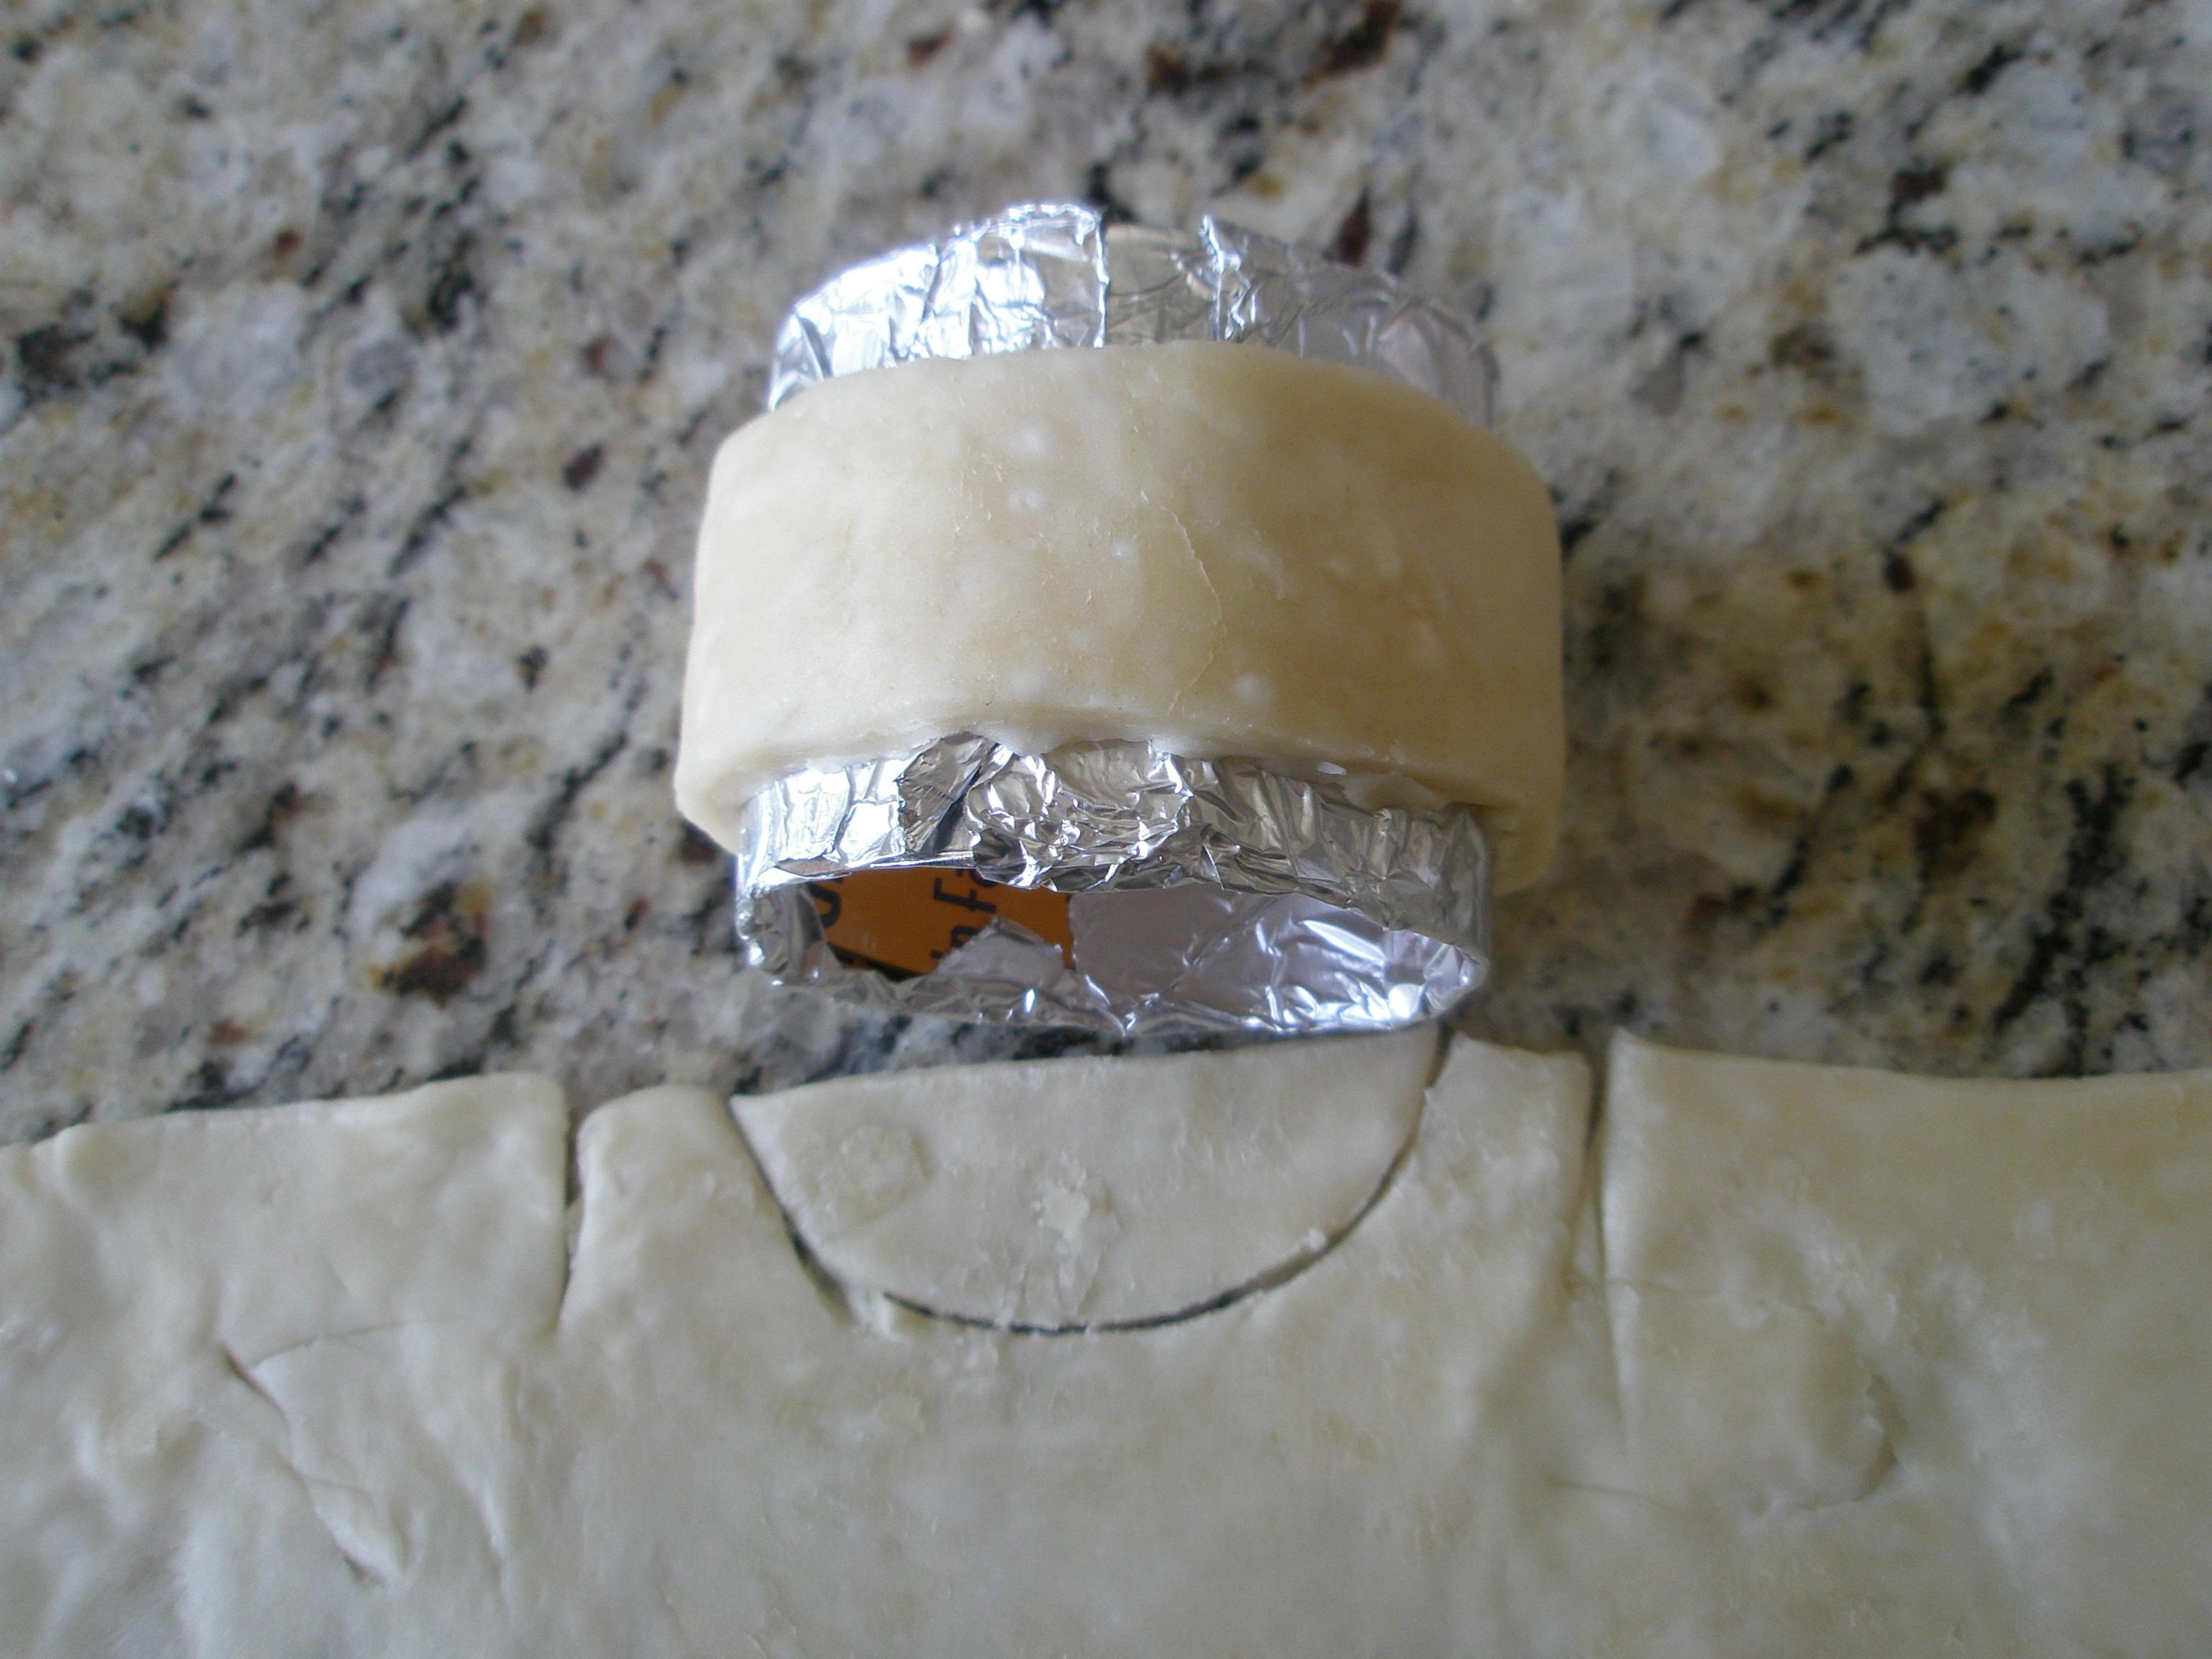 Picture of Making the Crackers - Making the Vertebrae Look Like Vertebrae